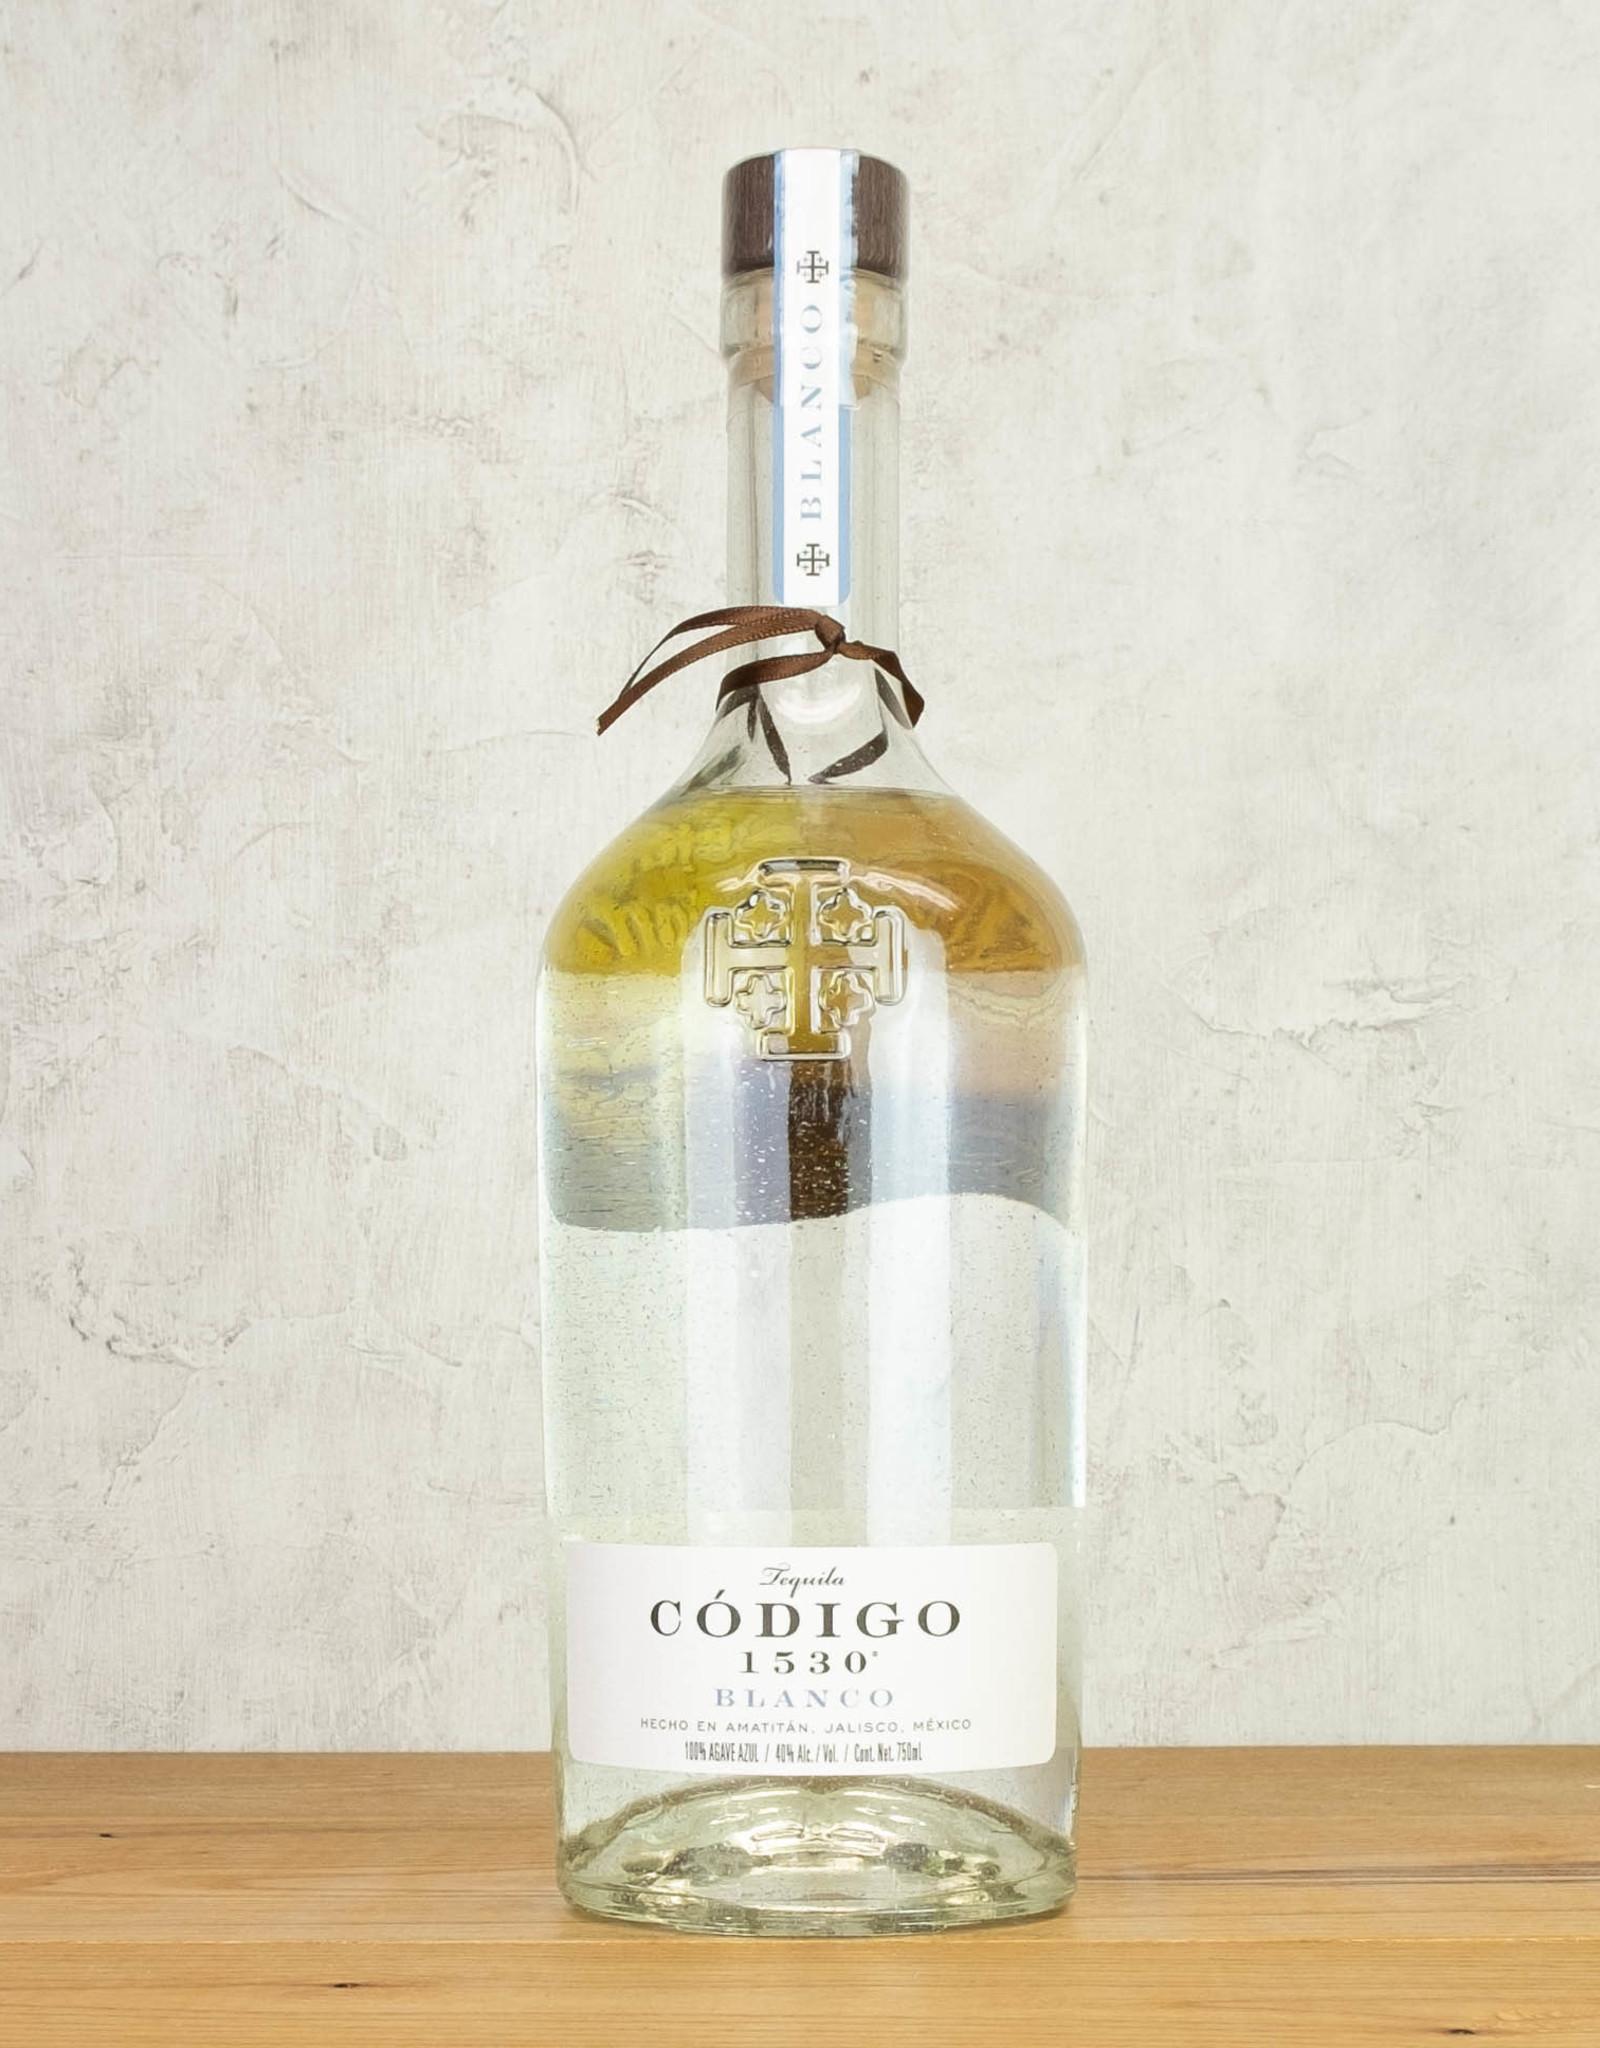 Codigo Tequila Blanco